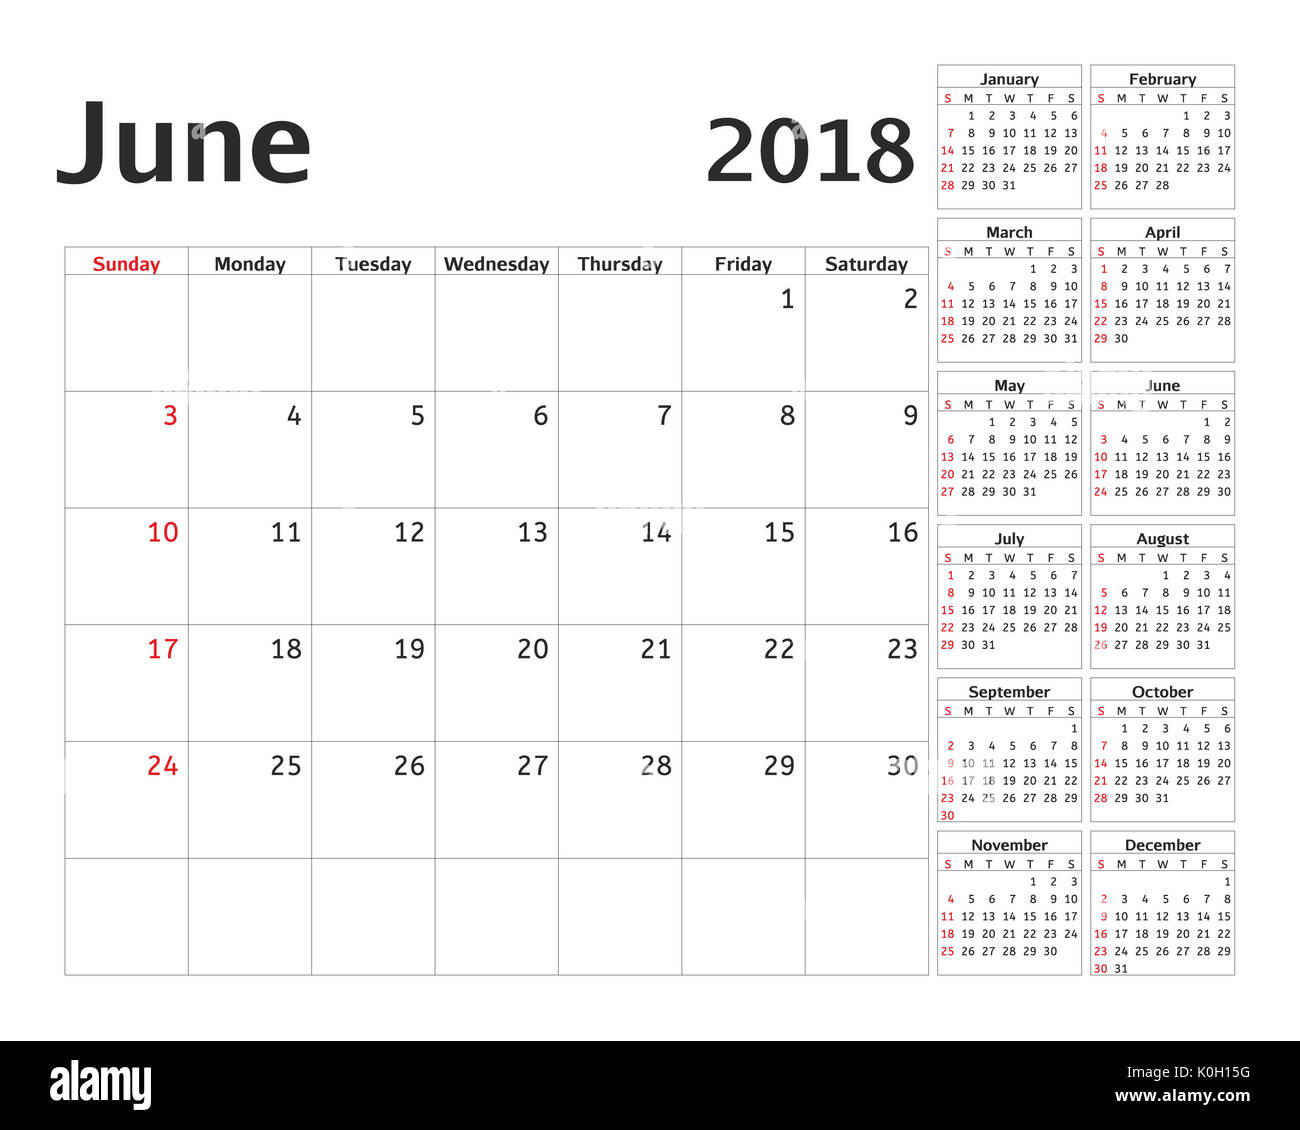 simple calendar planner for 2018 year calendar planning week